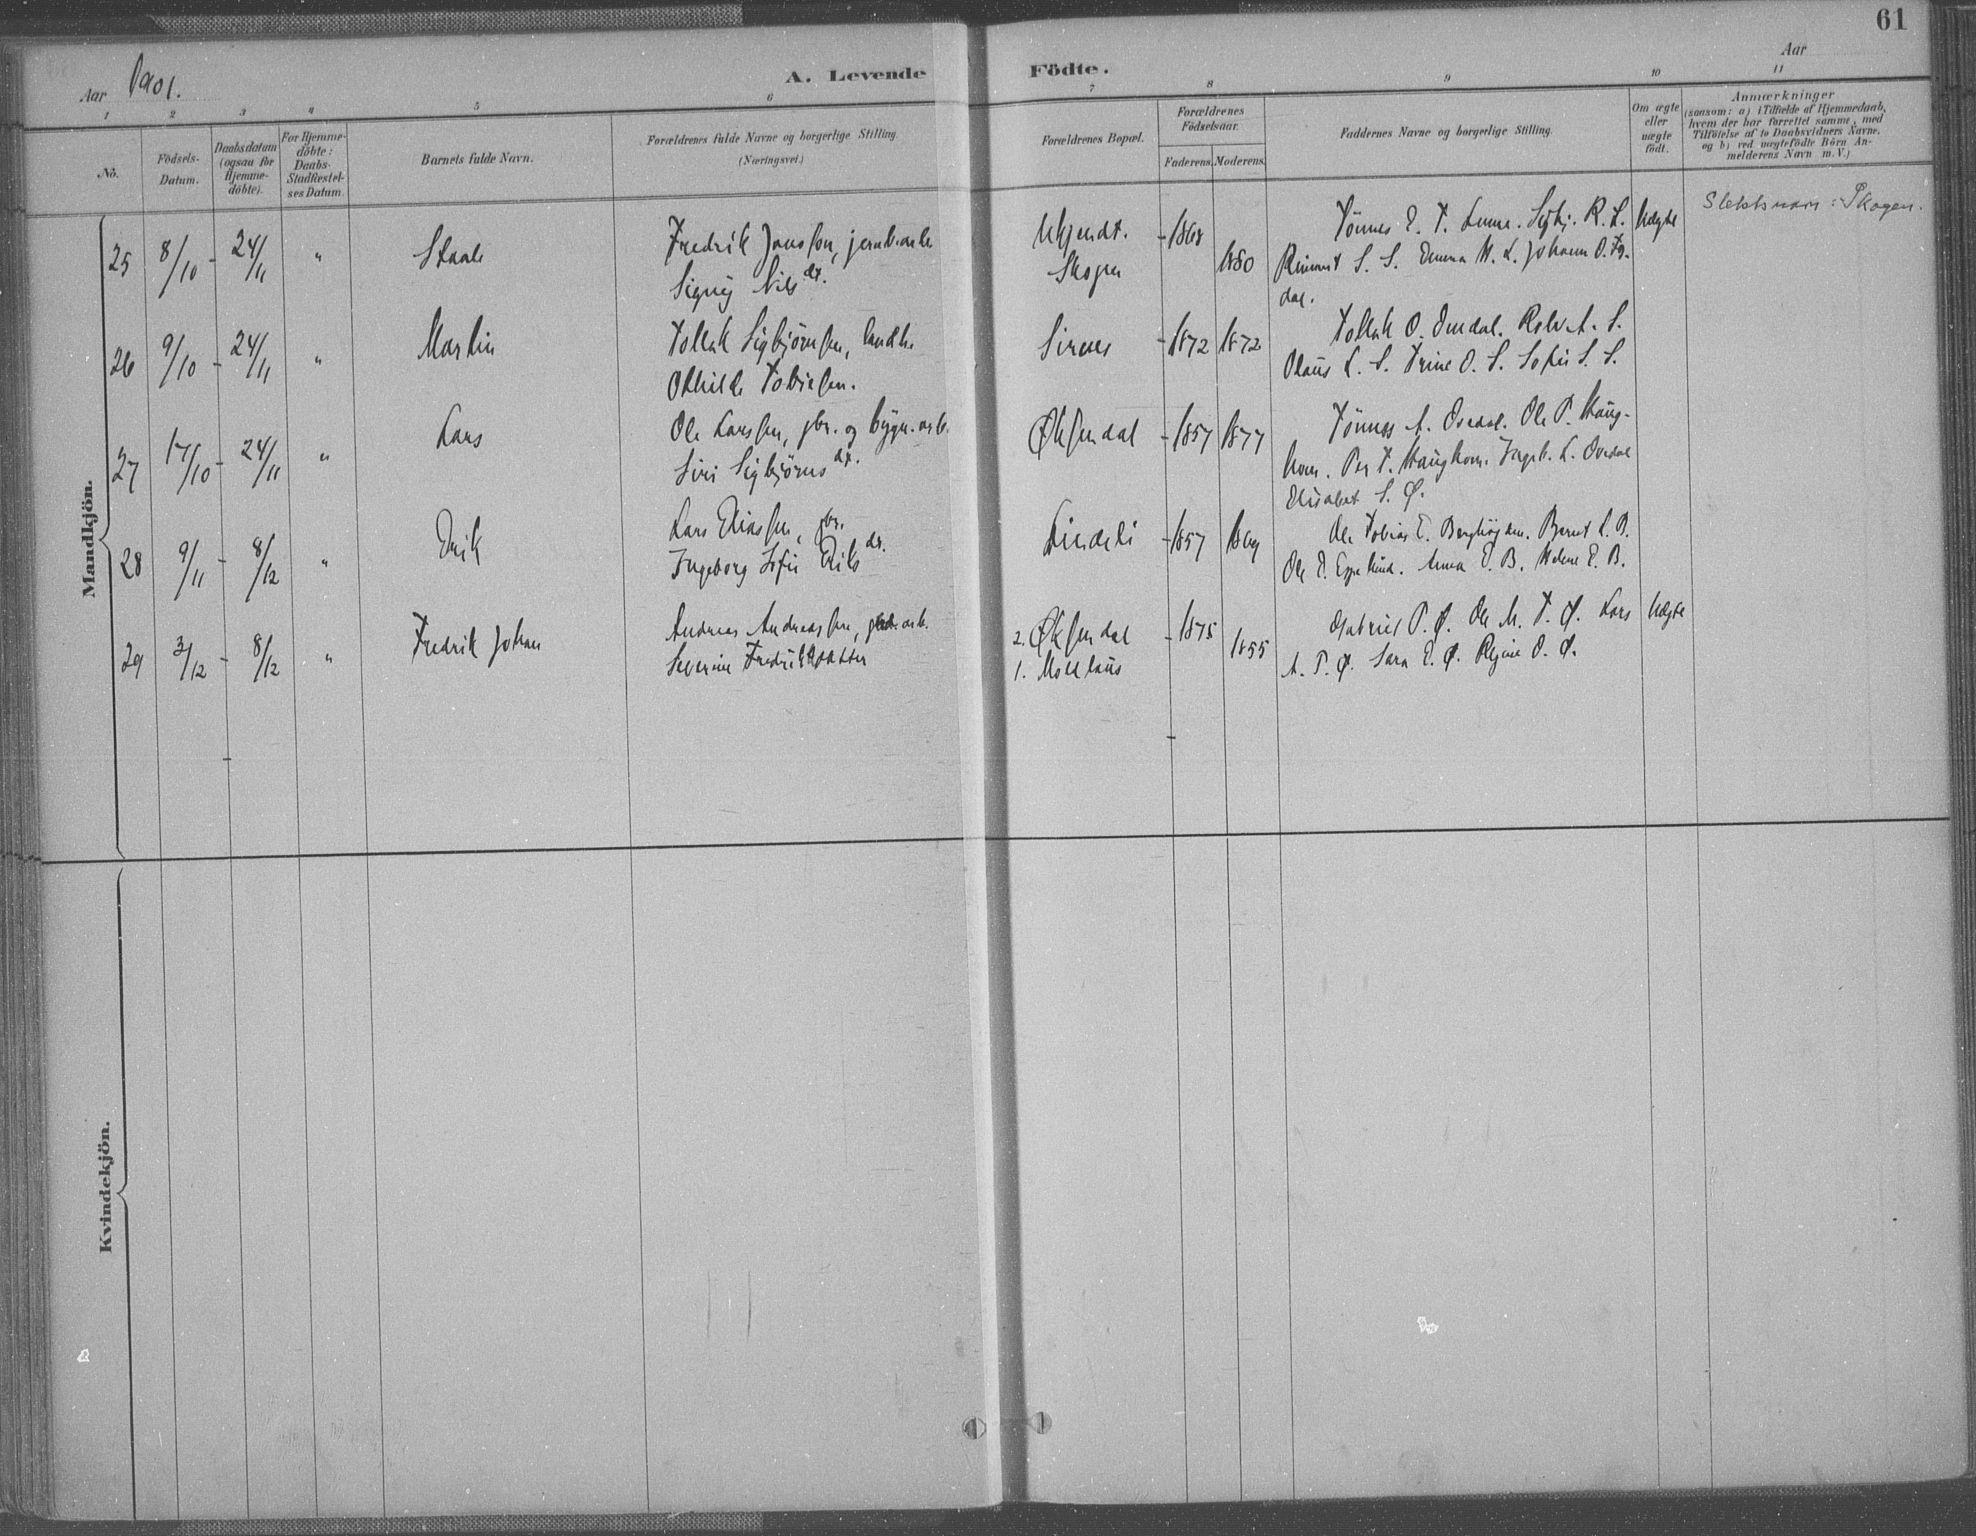 SAK, Bakke sokneprestkontor, F/Fa/Faa/L0008: Ministerialbok nr. A 8, 1887-1911, s. 61